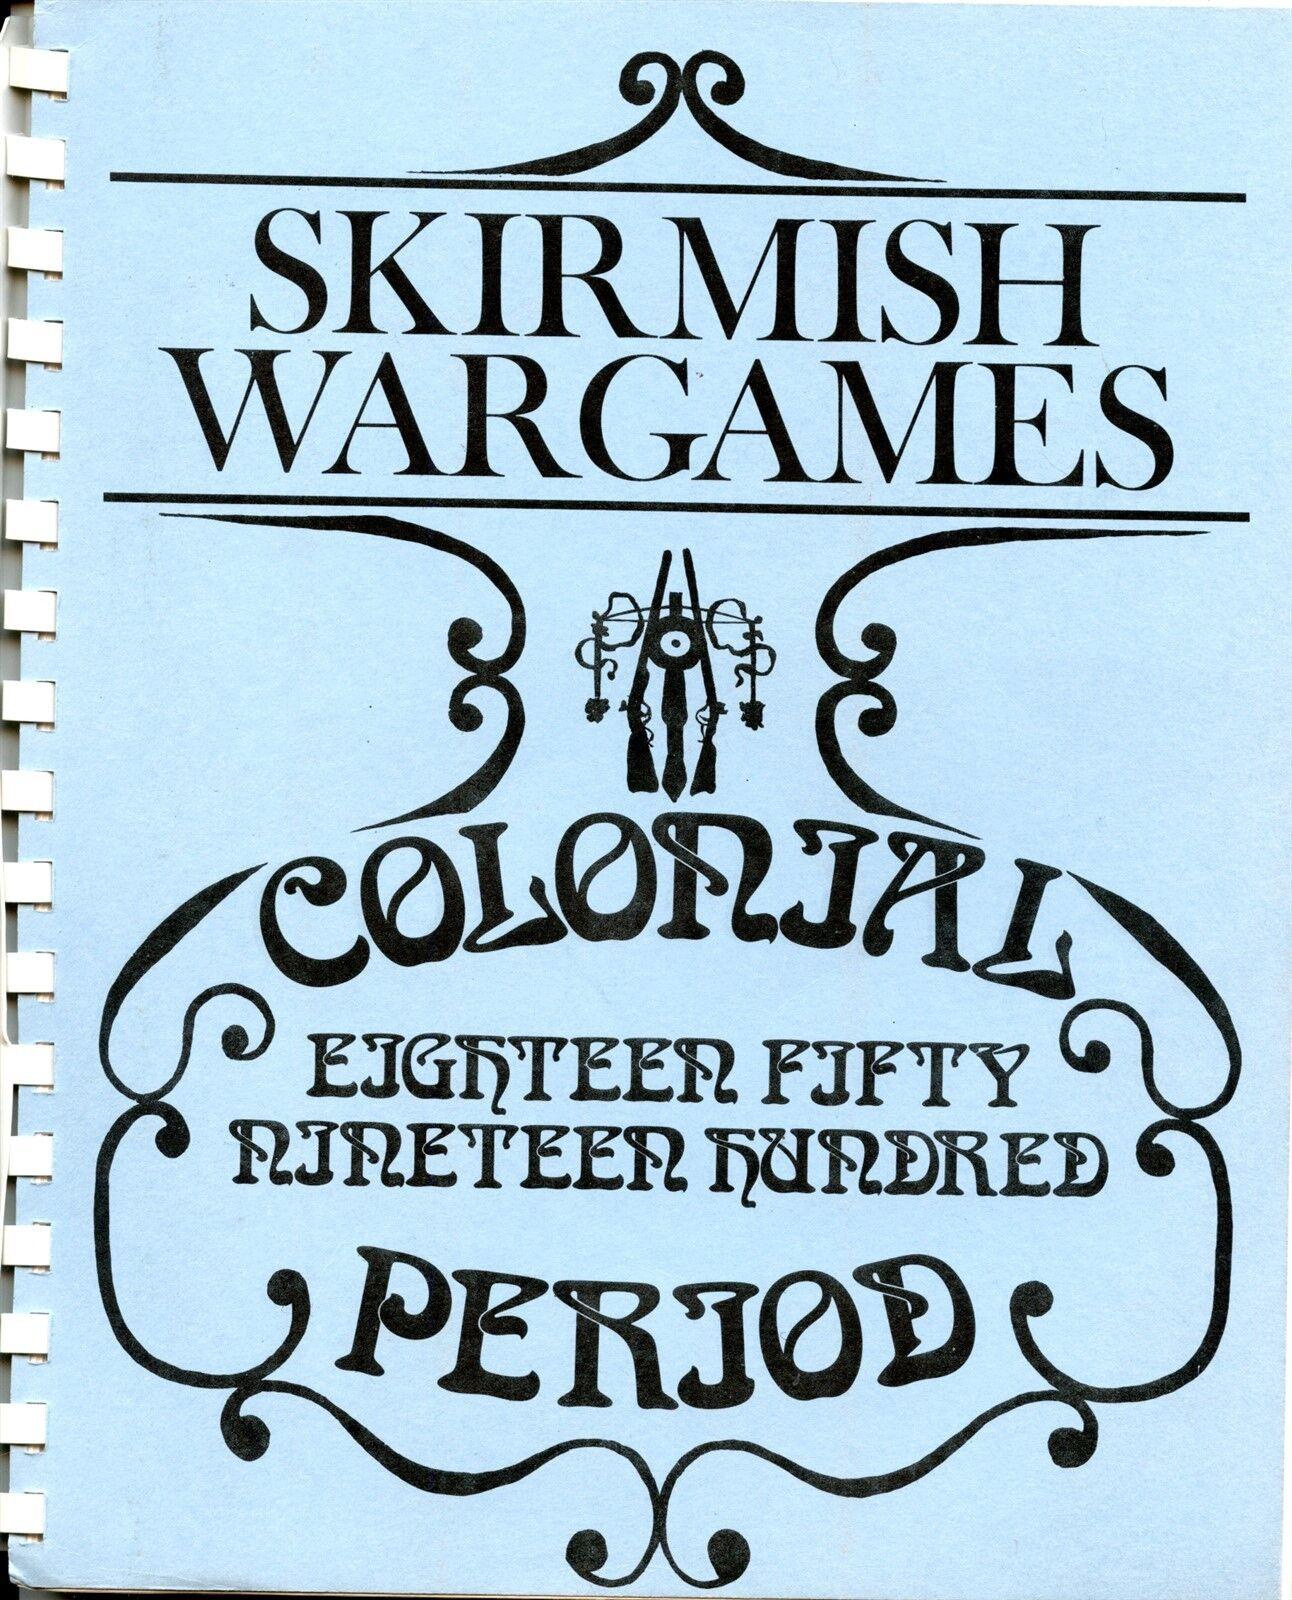 SKIRMISH WARGAMES COLONIAL PERIOD MINIATURE 1850-1900 NM